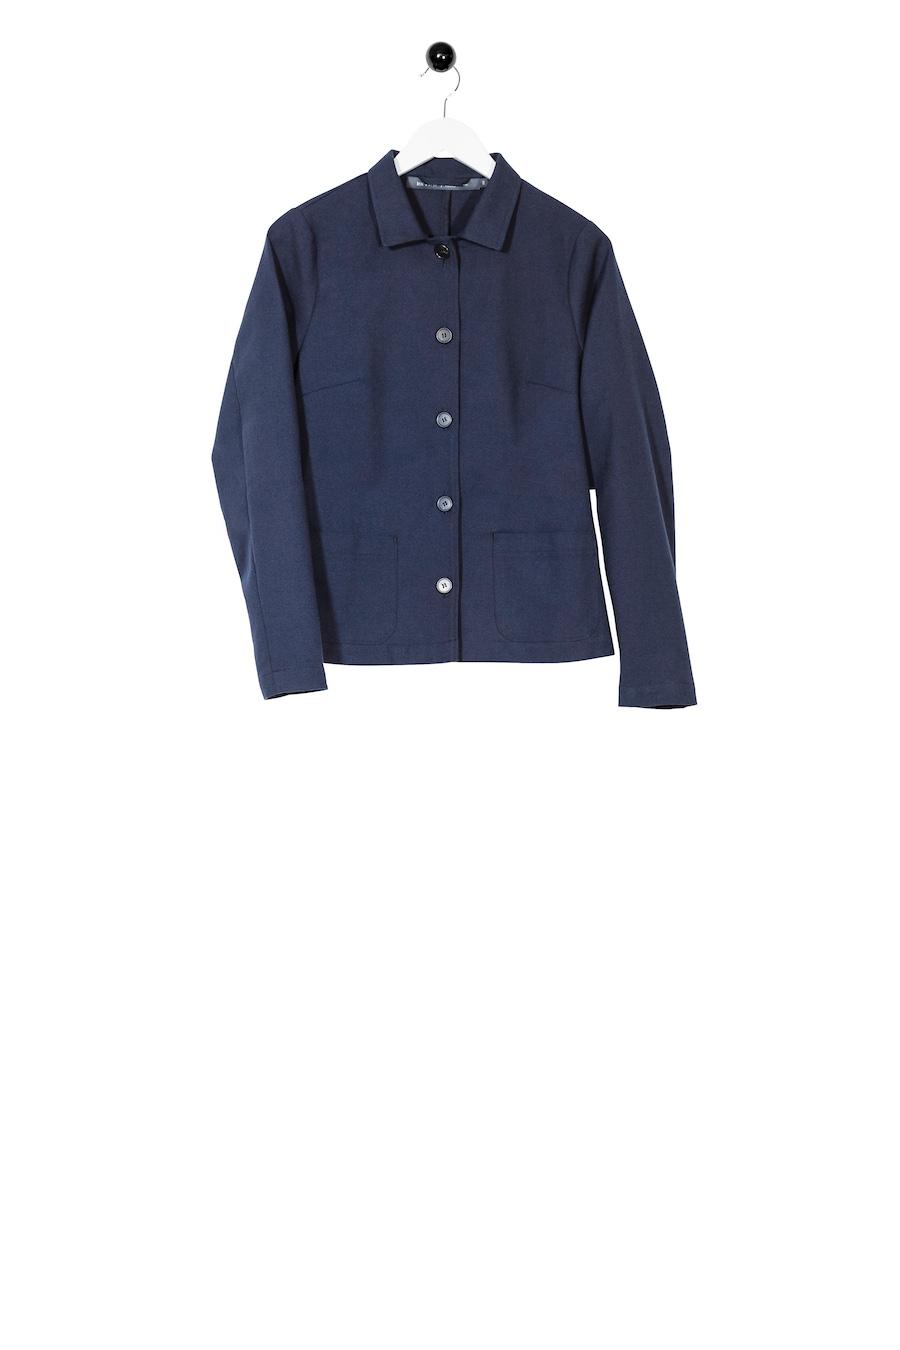 St Ninians jacket